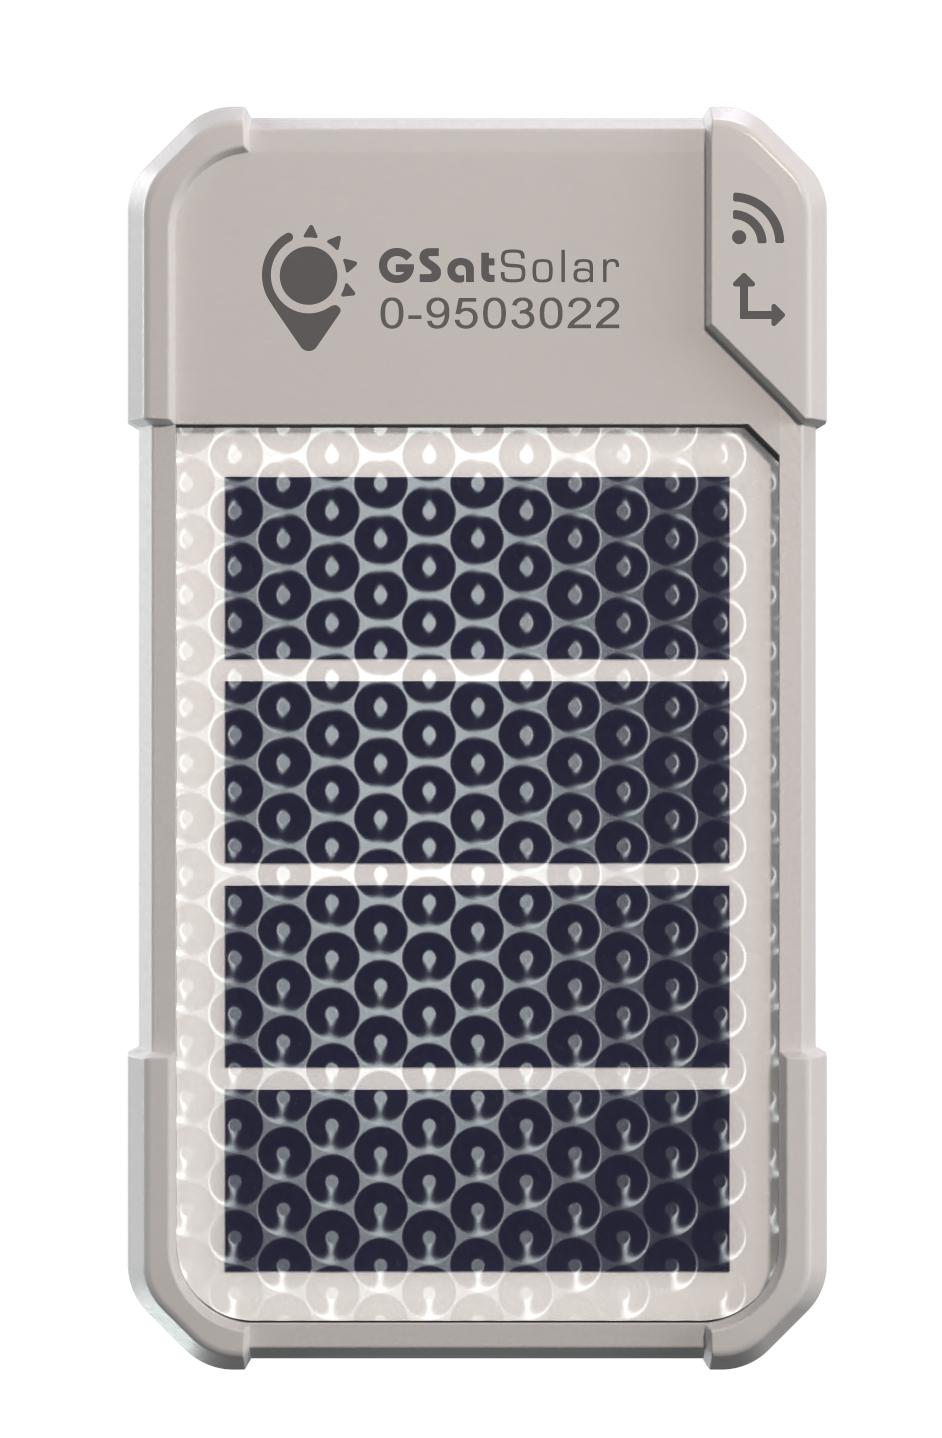 GSatSolar Satellite Tracker - Front